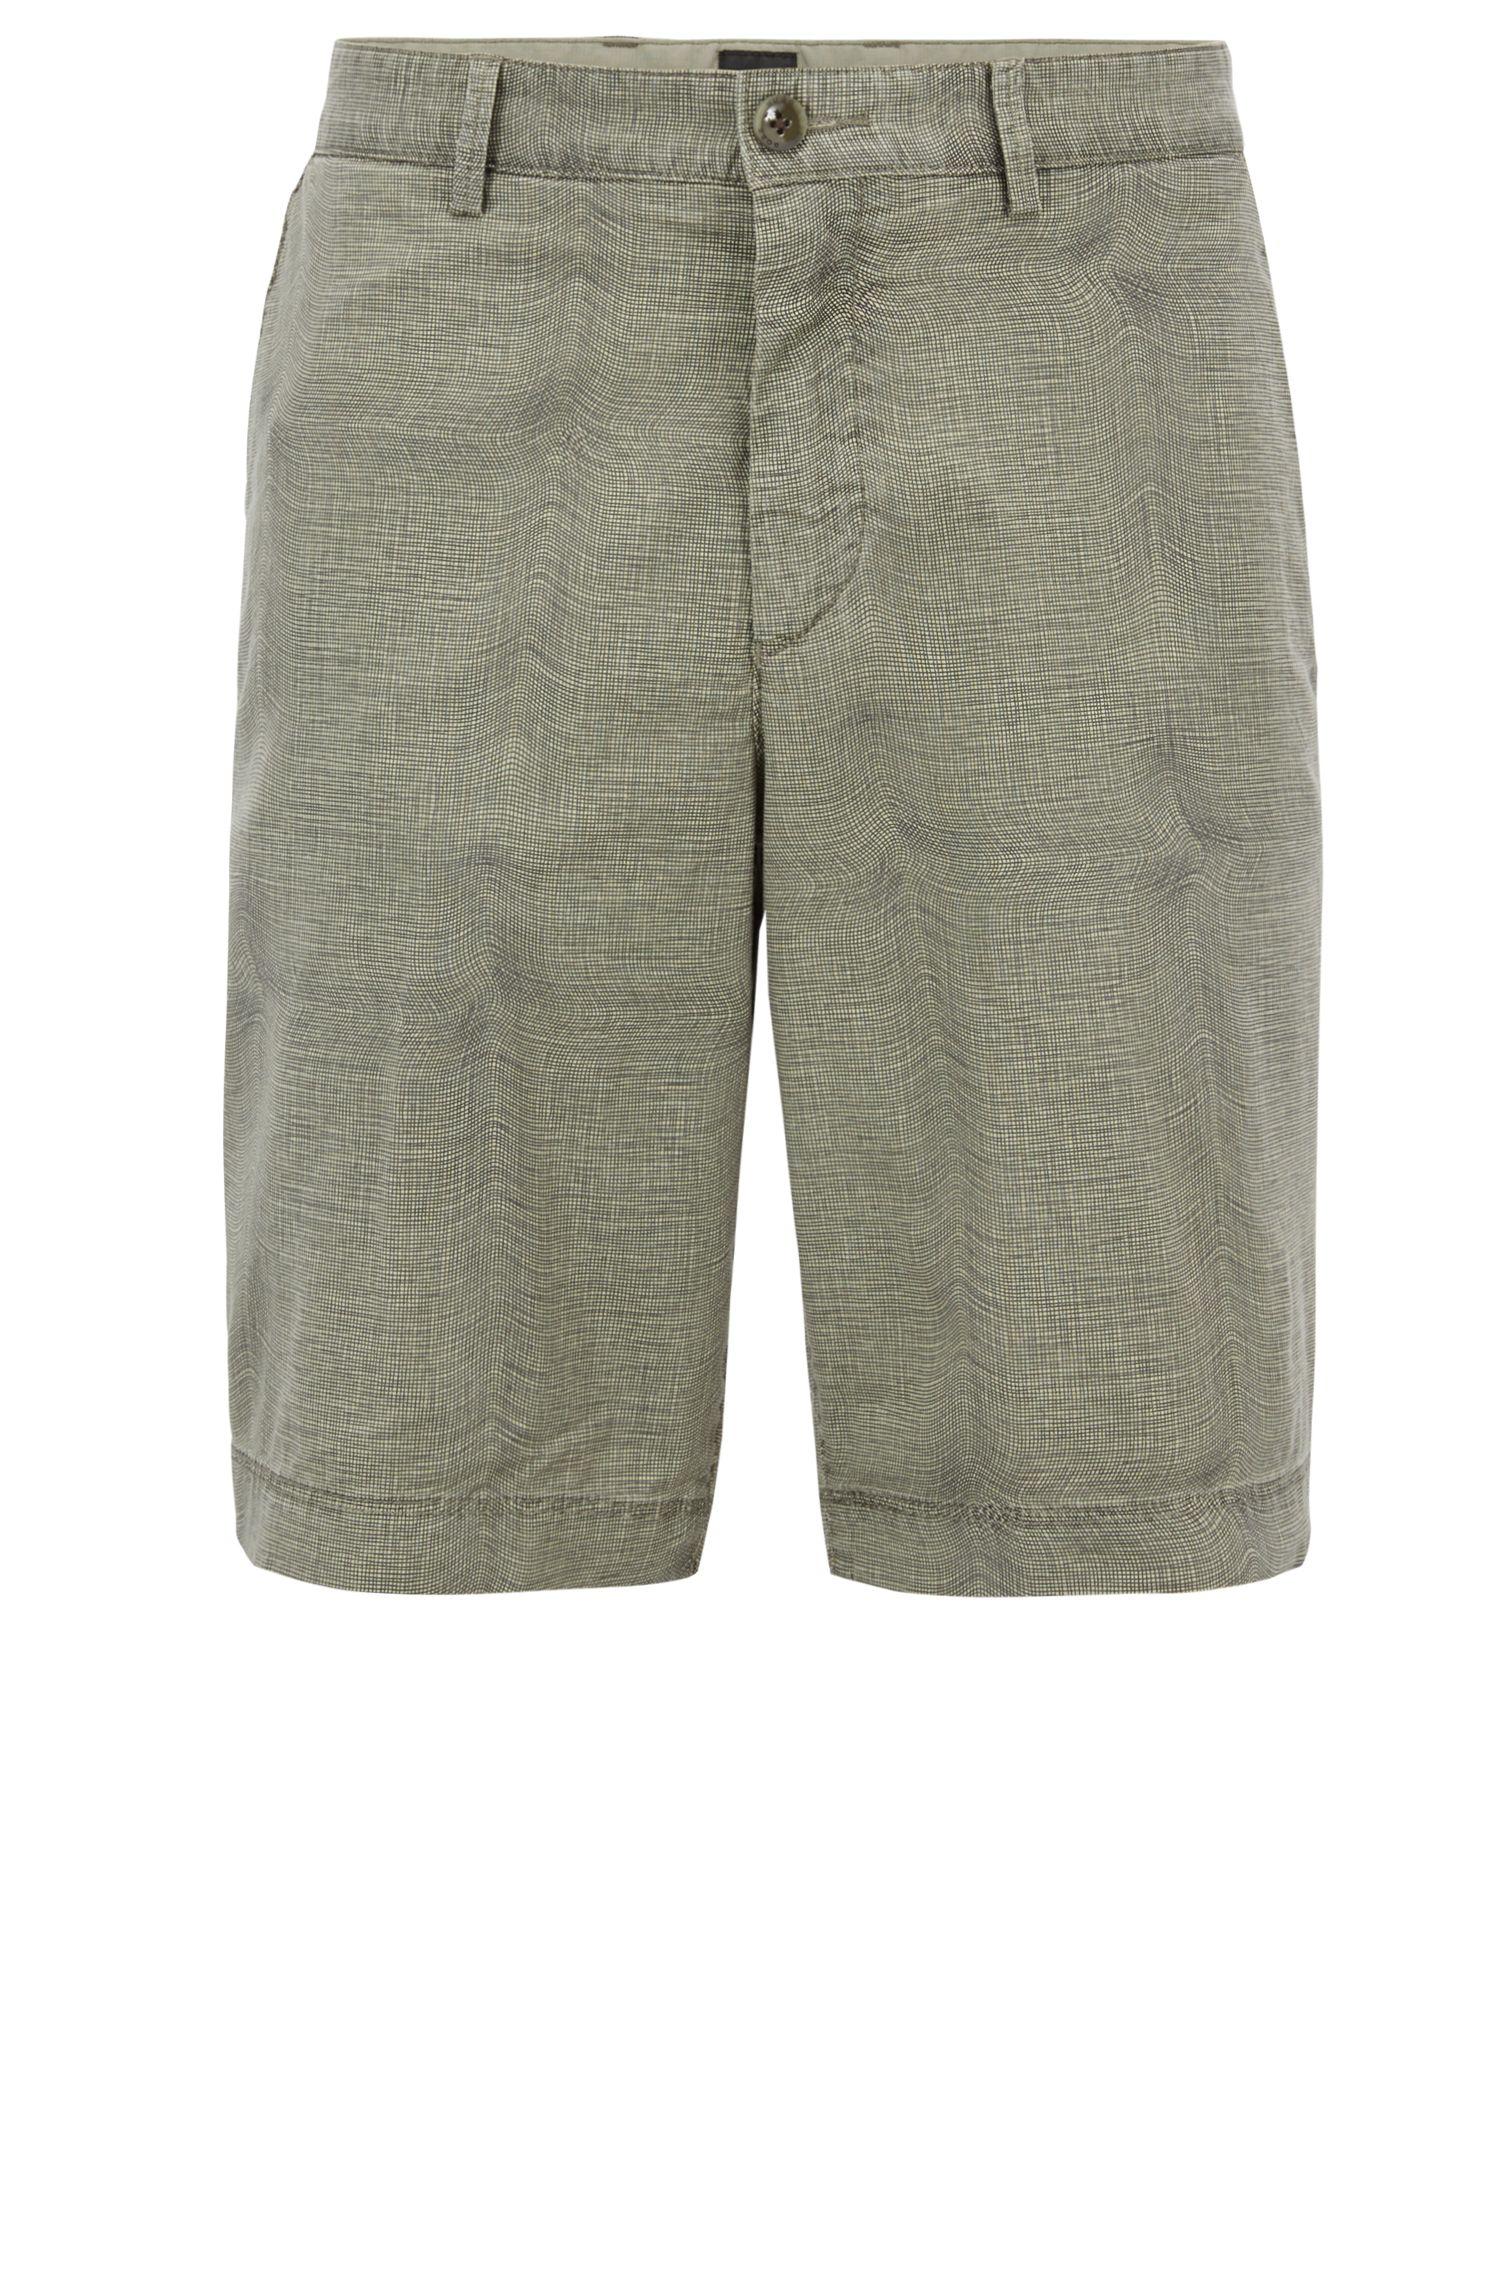 Shorts en algodón elástico con microcuadros